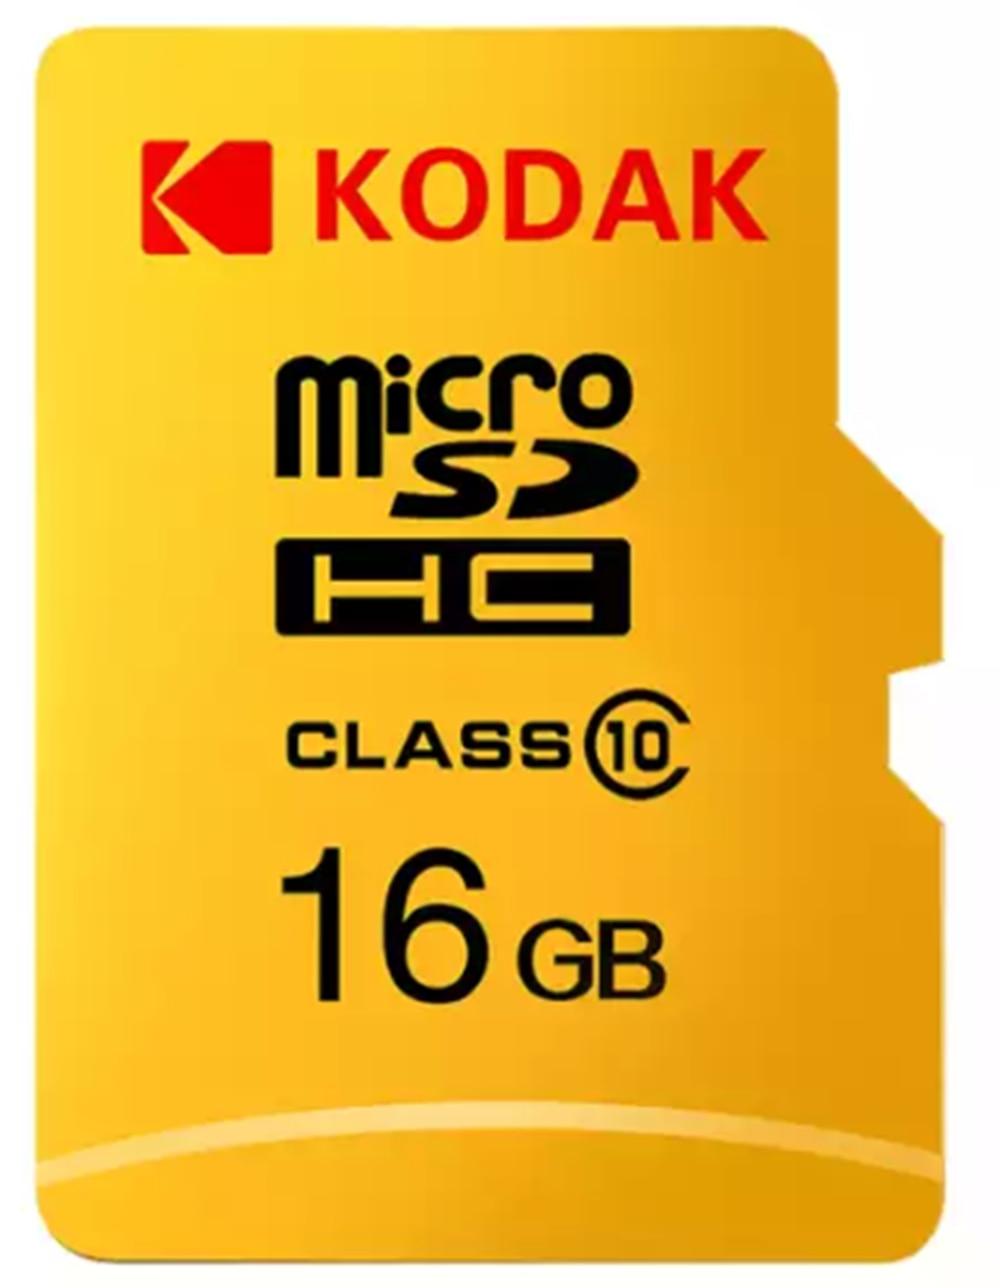 KODAK Micro Card 16GB 32GB SDHC 128GB 256GB SDXC UHS-I U3 V30 A1 4K Ultra Class 10 TF Card High Speed Card For Video Camera